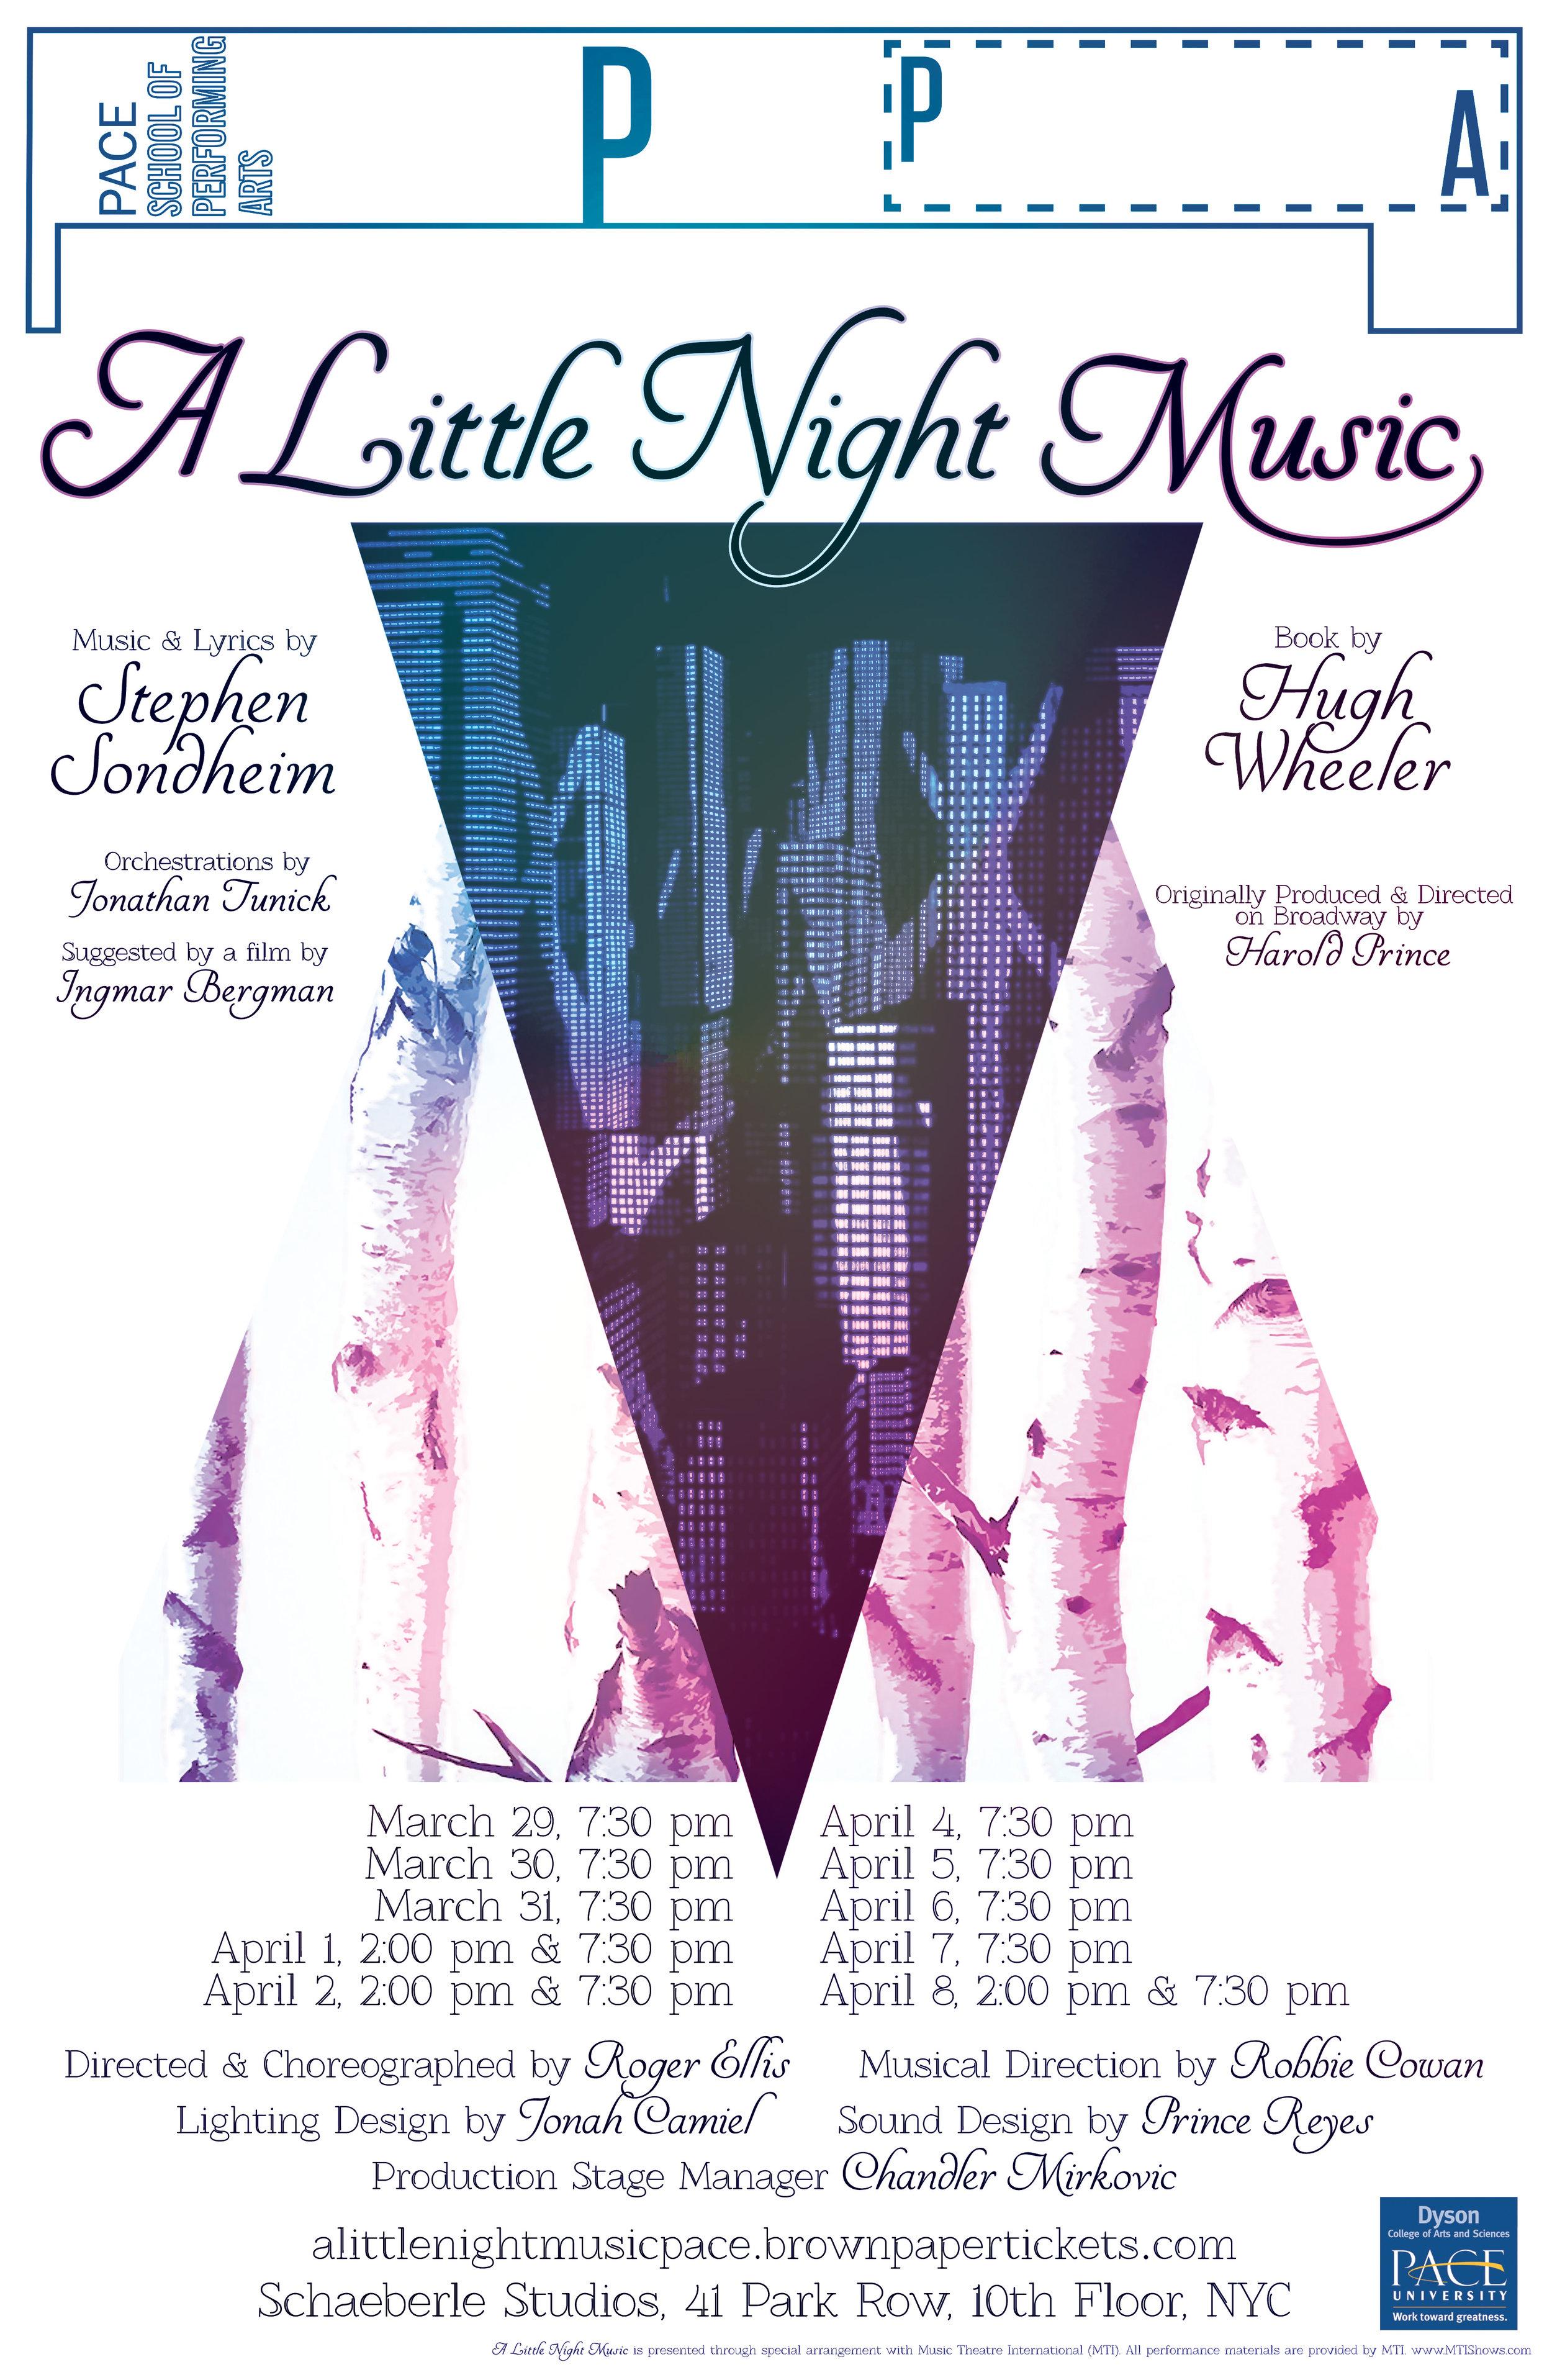 NightMusic_Final-Online_3.20.jpg